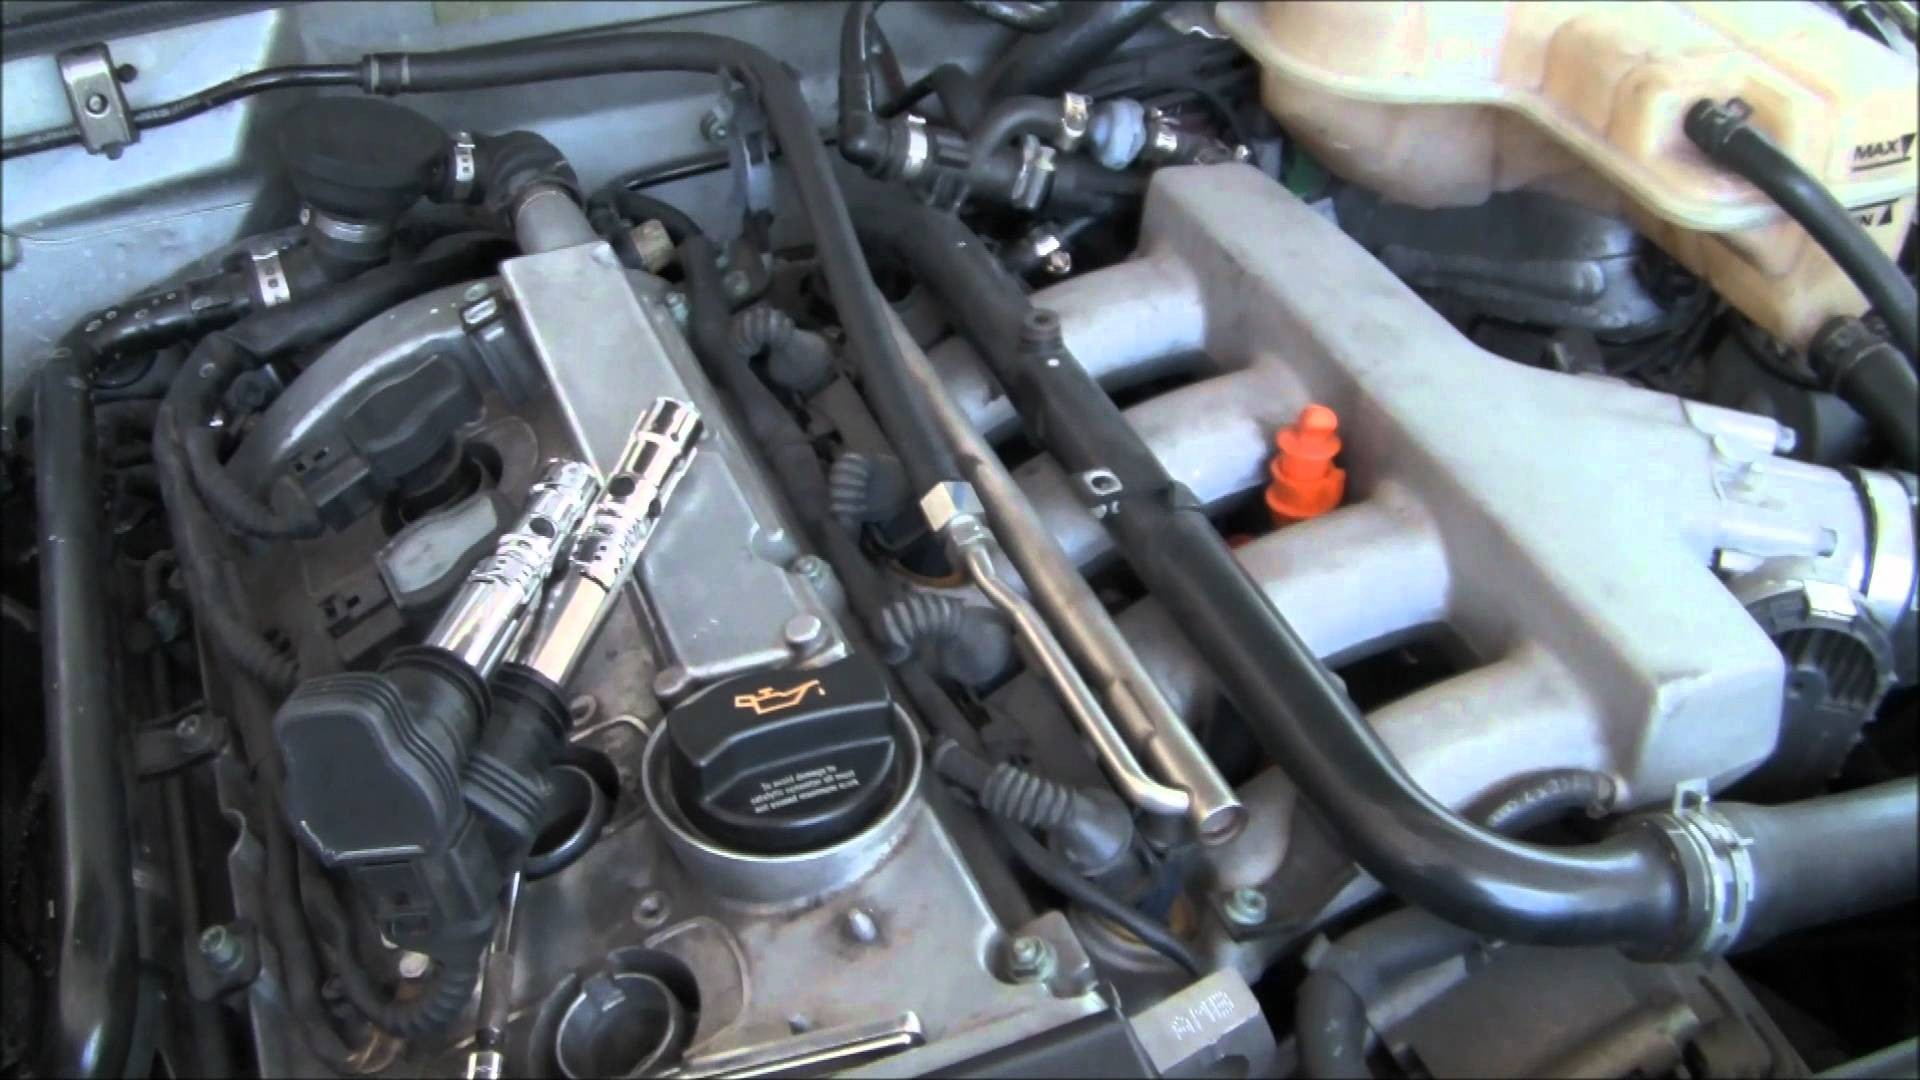 hight resolution of 2002 vw passat 1 8 t engine diagram 2004 audi a4 coolant flange replacement part 1